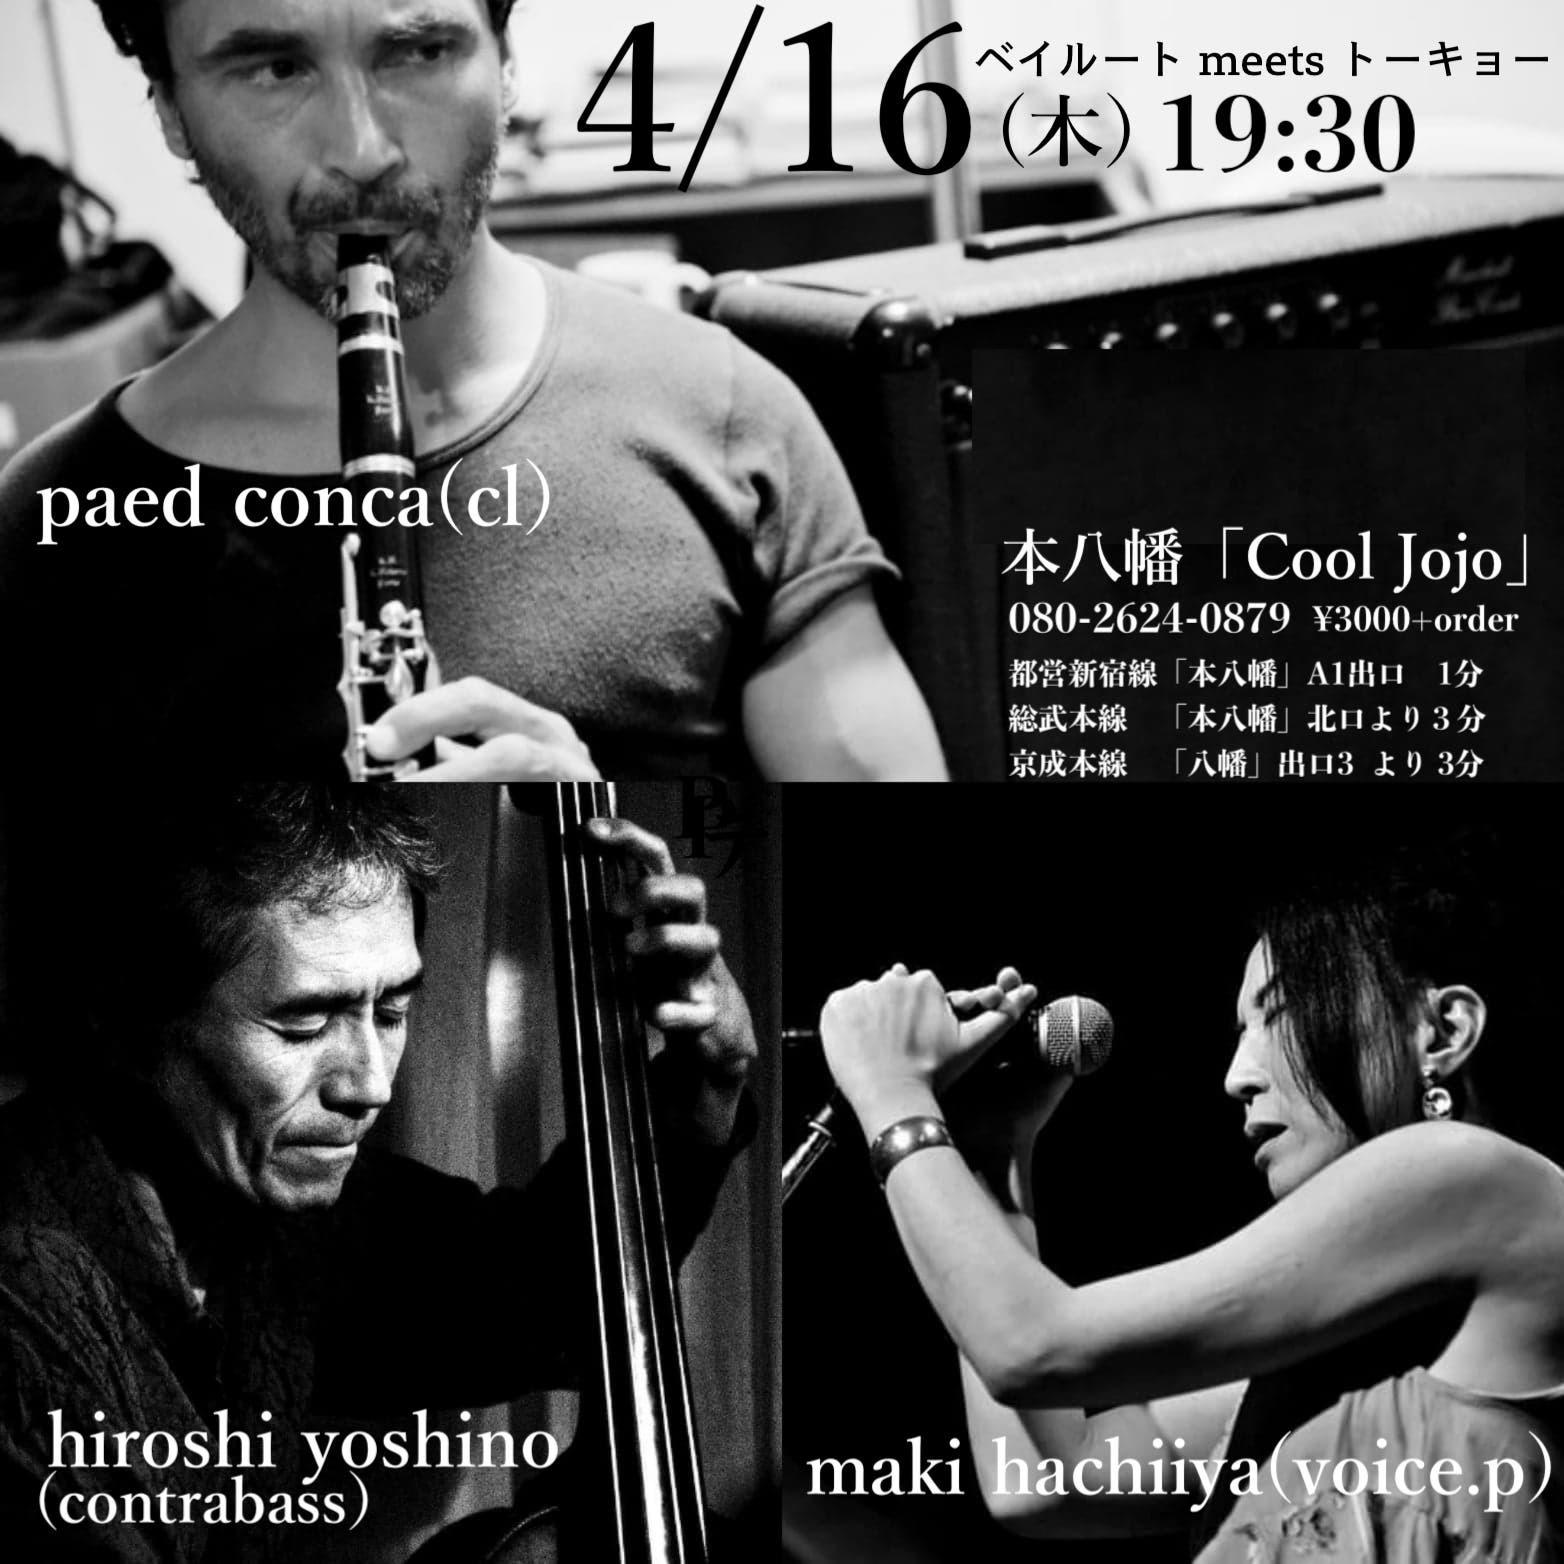 Maki Hachiya 2020:2月〜3月 live schedule_d0239981_06312663.jpg